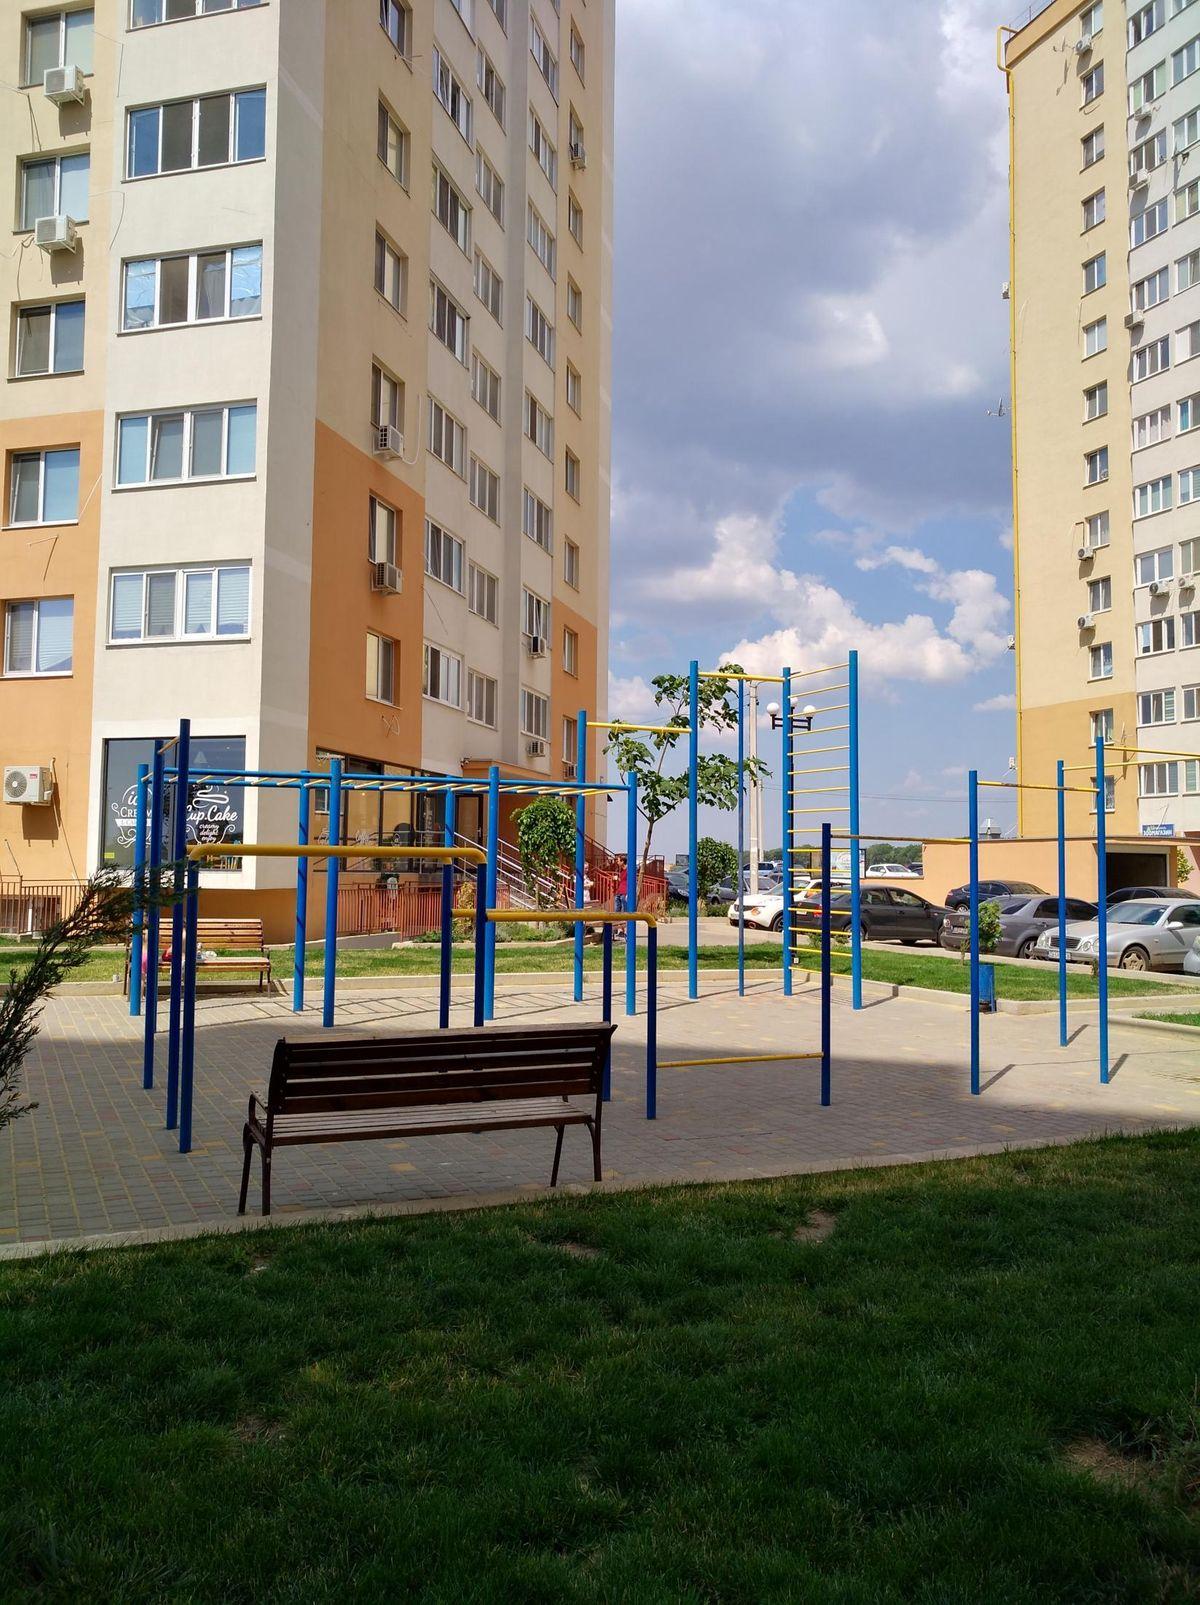 Odessa Oblast - Street Workout Park - ЖМ  Радужный  11/1